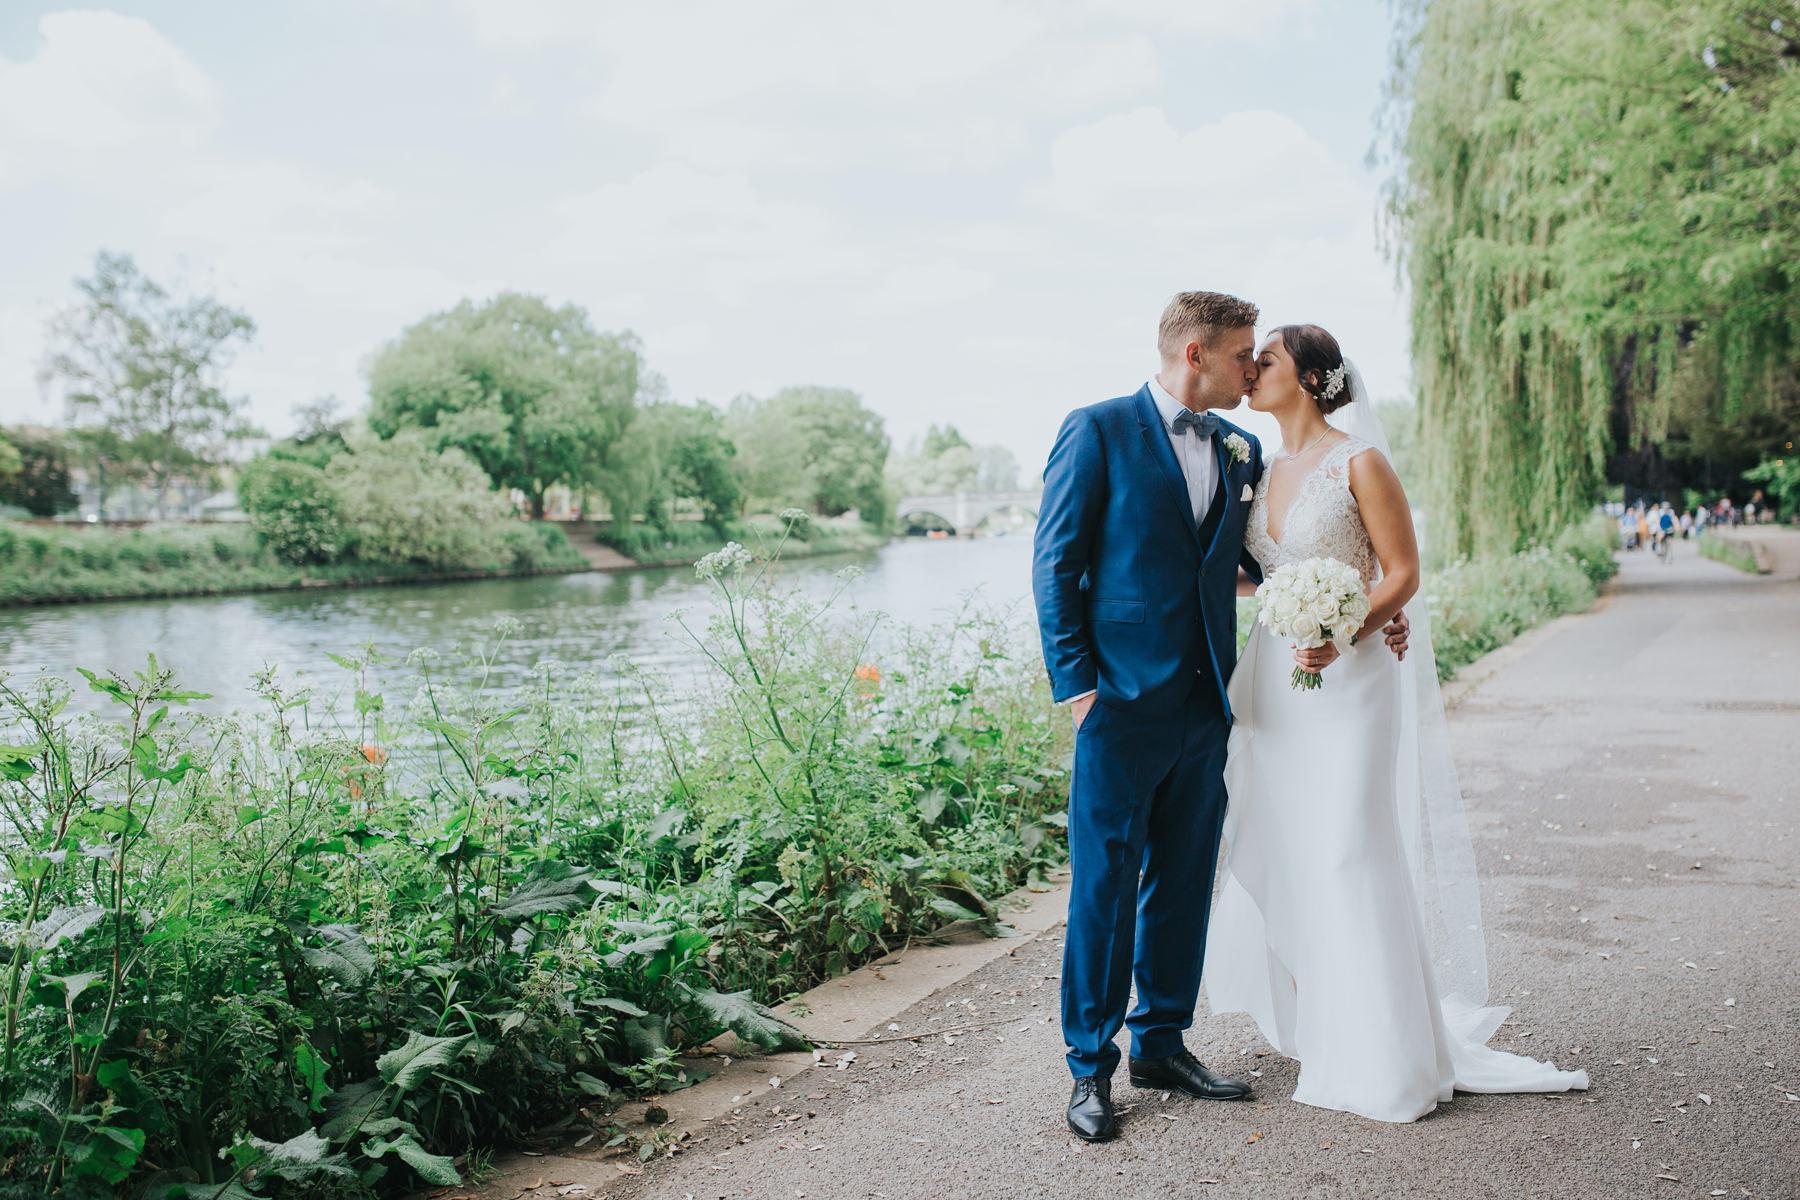 CRL-386-The Bingham wedding Richmond-Claire Rob bridal couple portraits on Thamespath.jpg